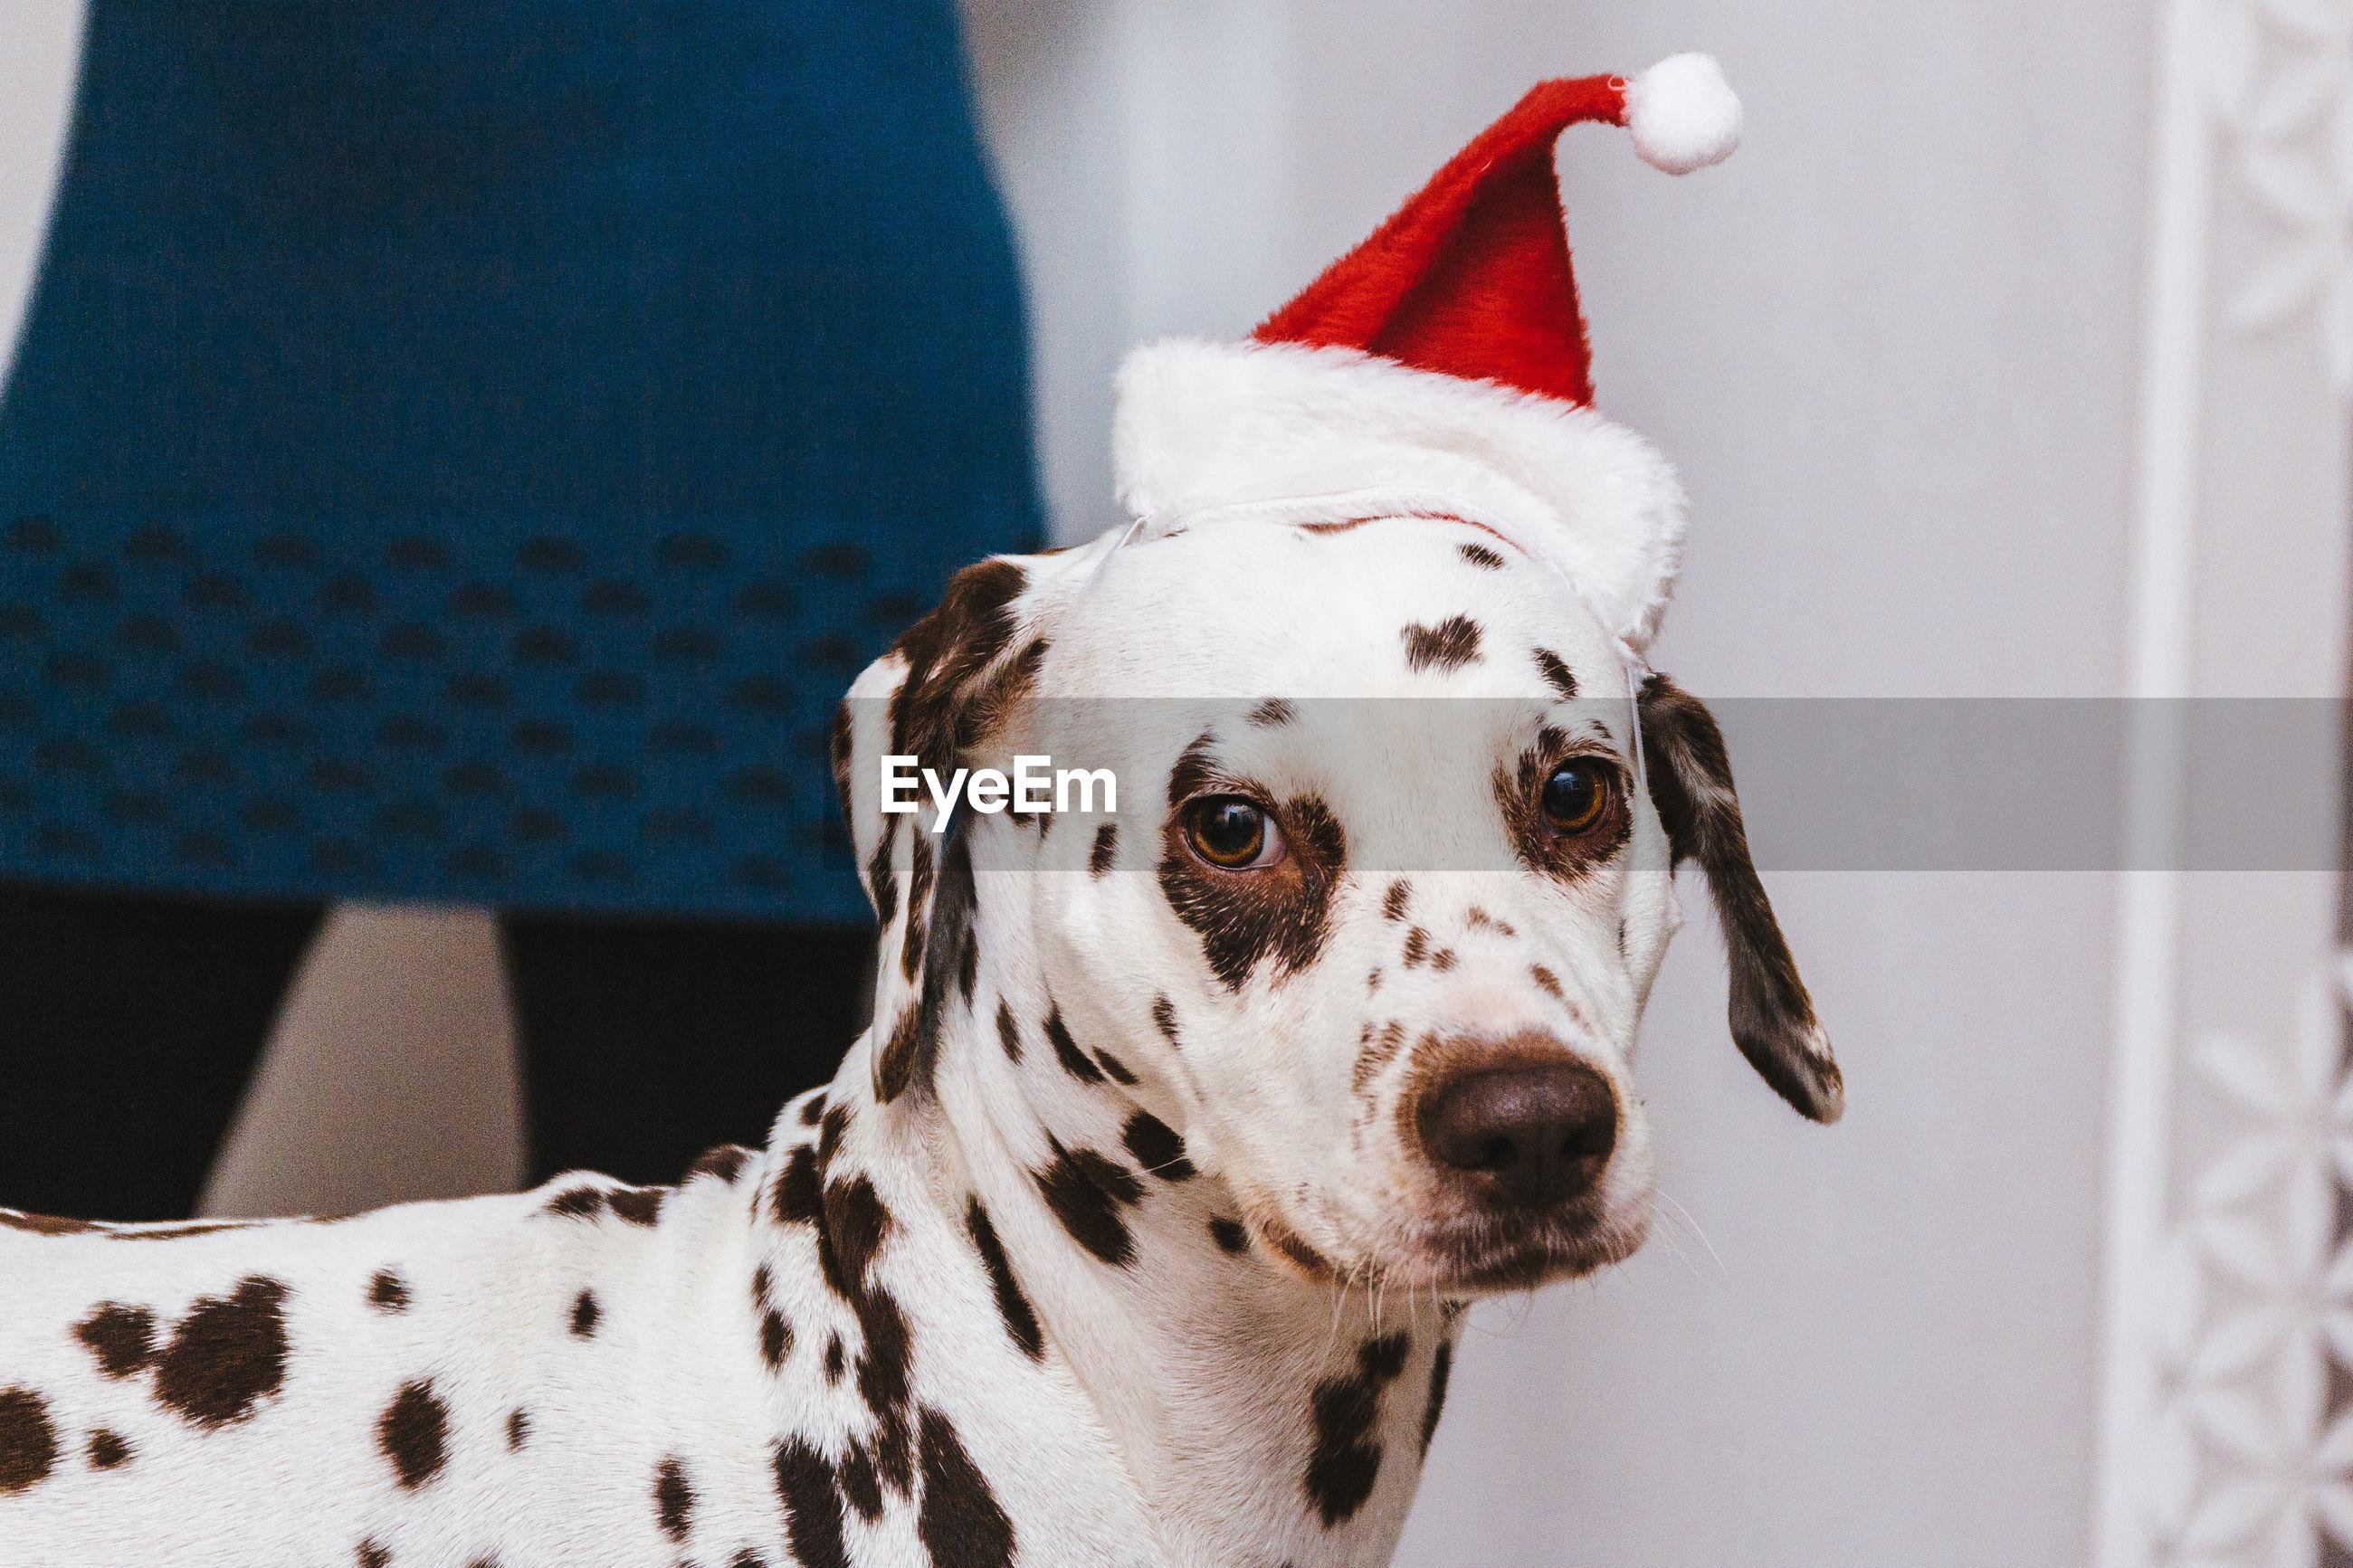 Dalmatian dog wearing santa hat